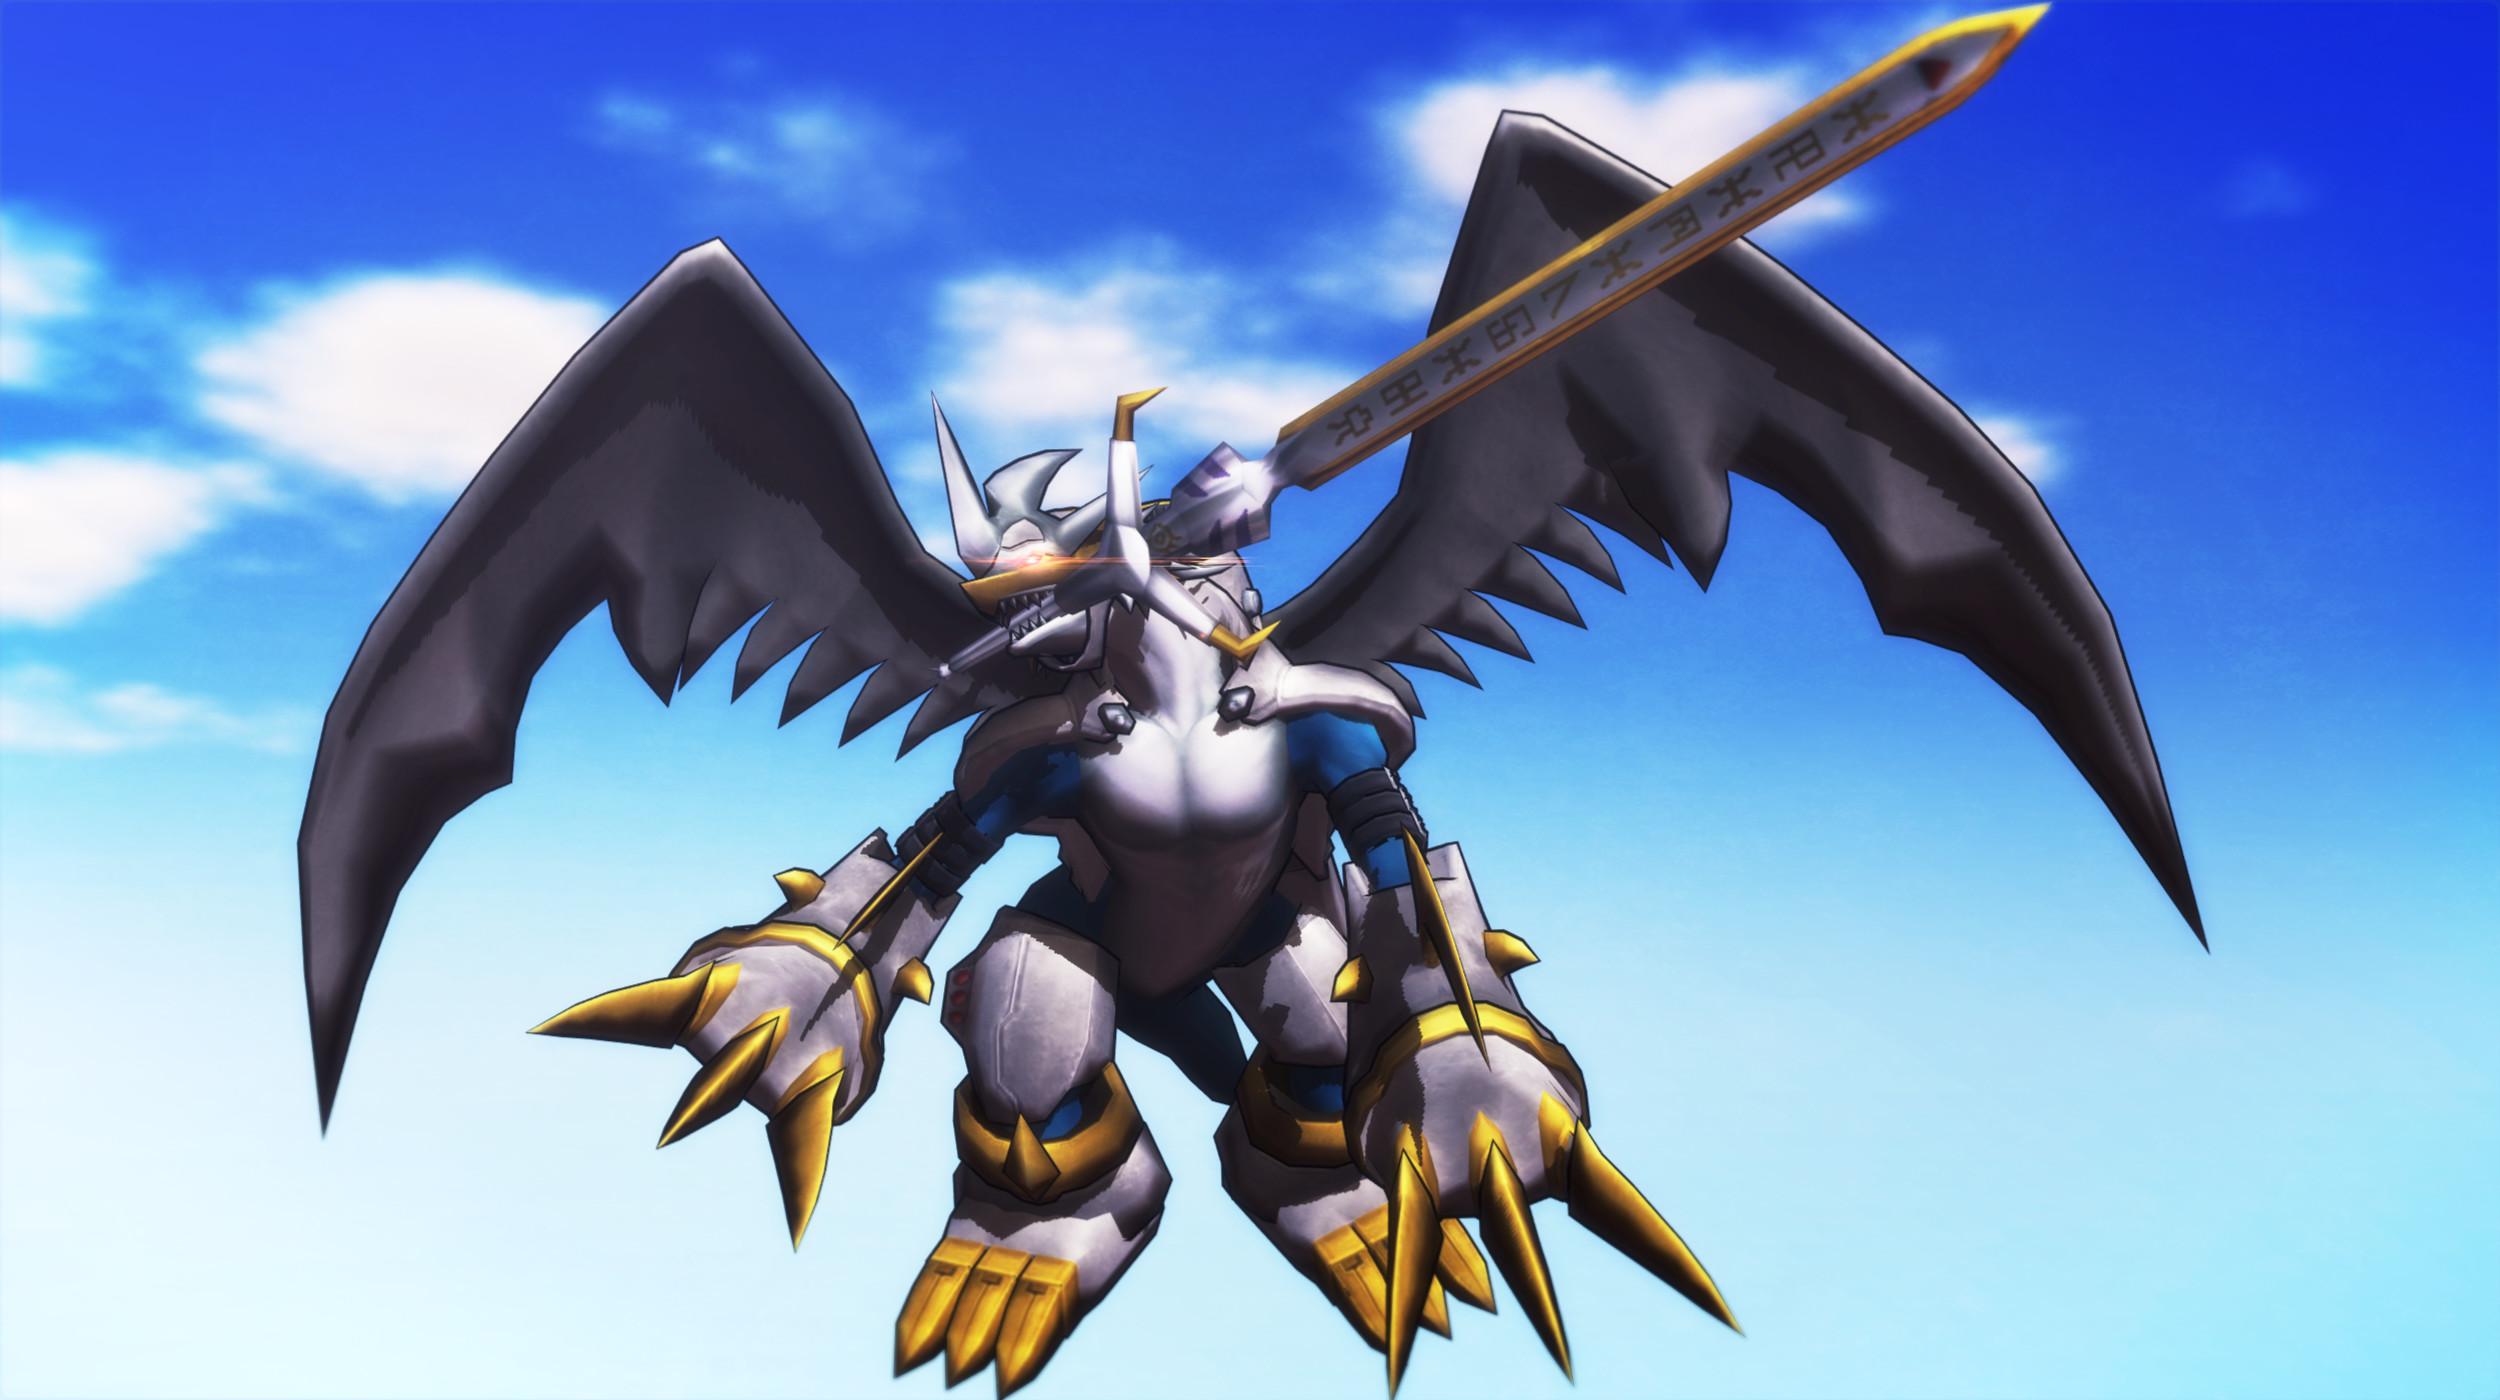 Imperialdramon Paladin Dragon Mode by Dudemon on DeviantArt